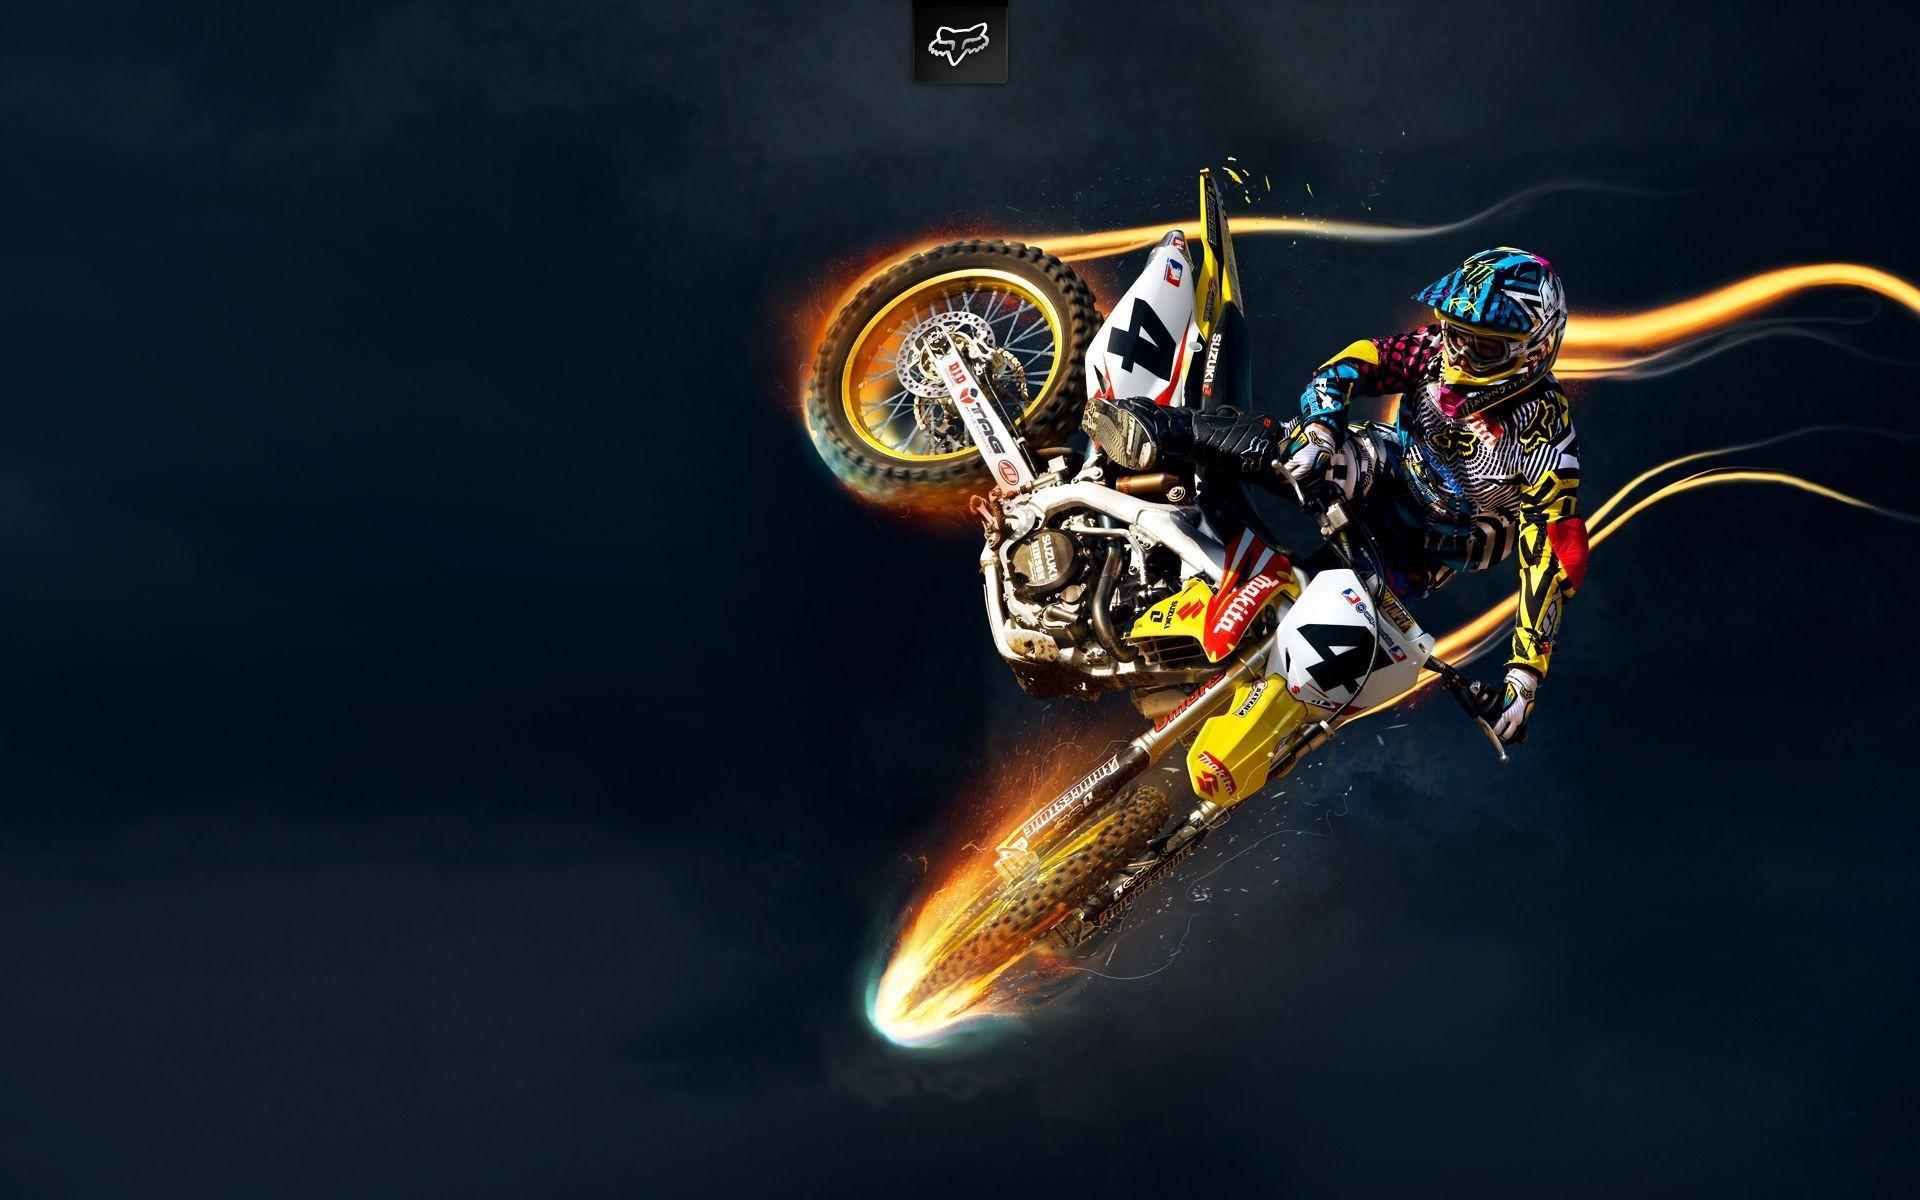 Suzuki Motocross Wallpapers | HD Wallpapers · Extreme MotocrossMotocross  RacingFox …